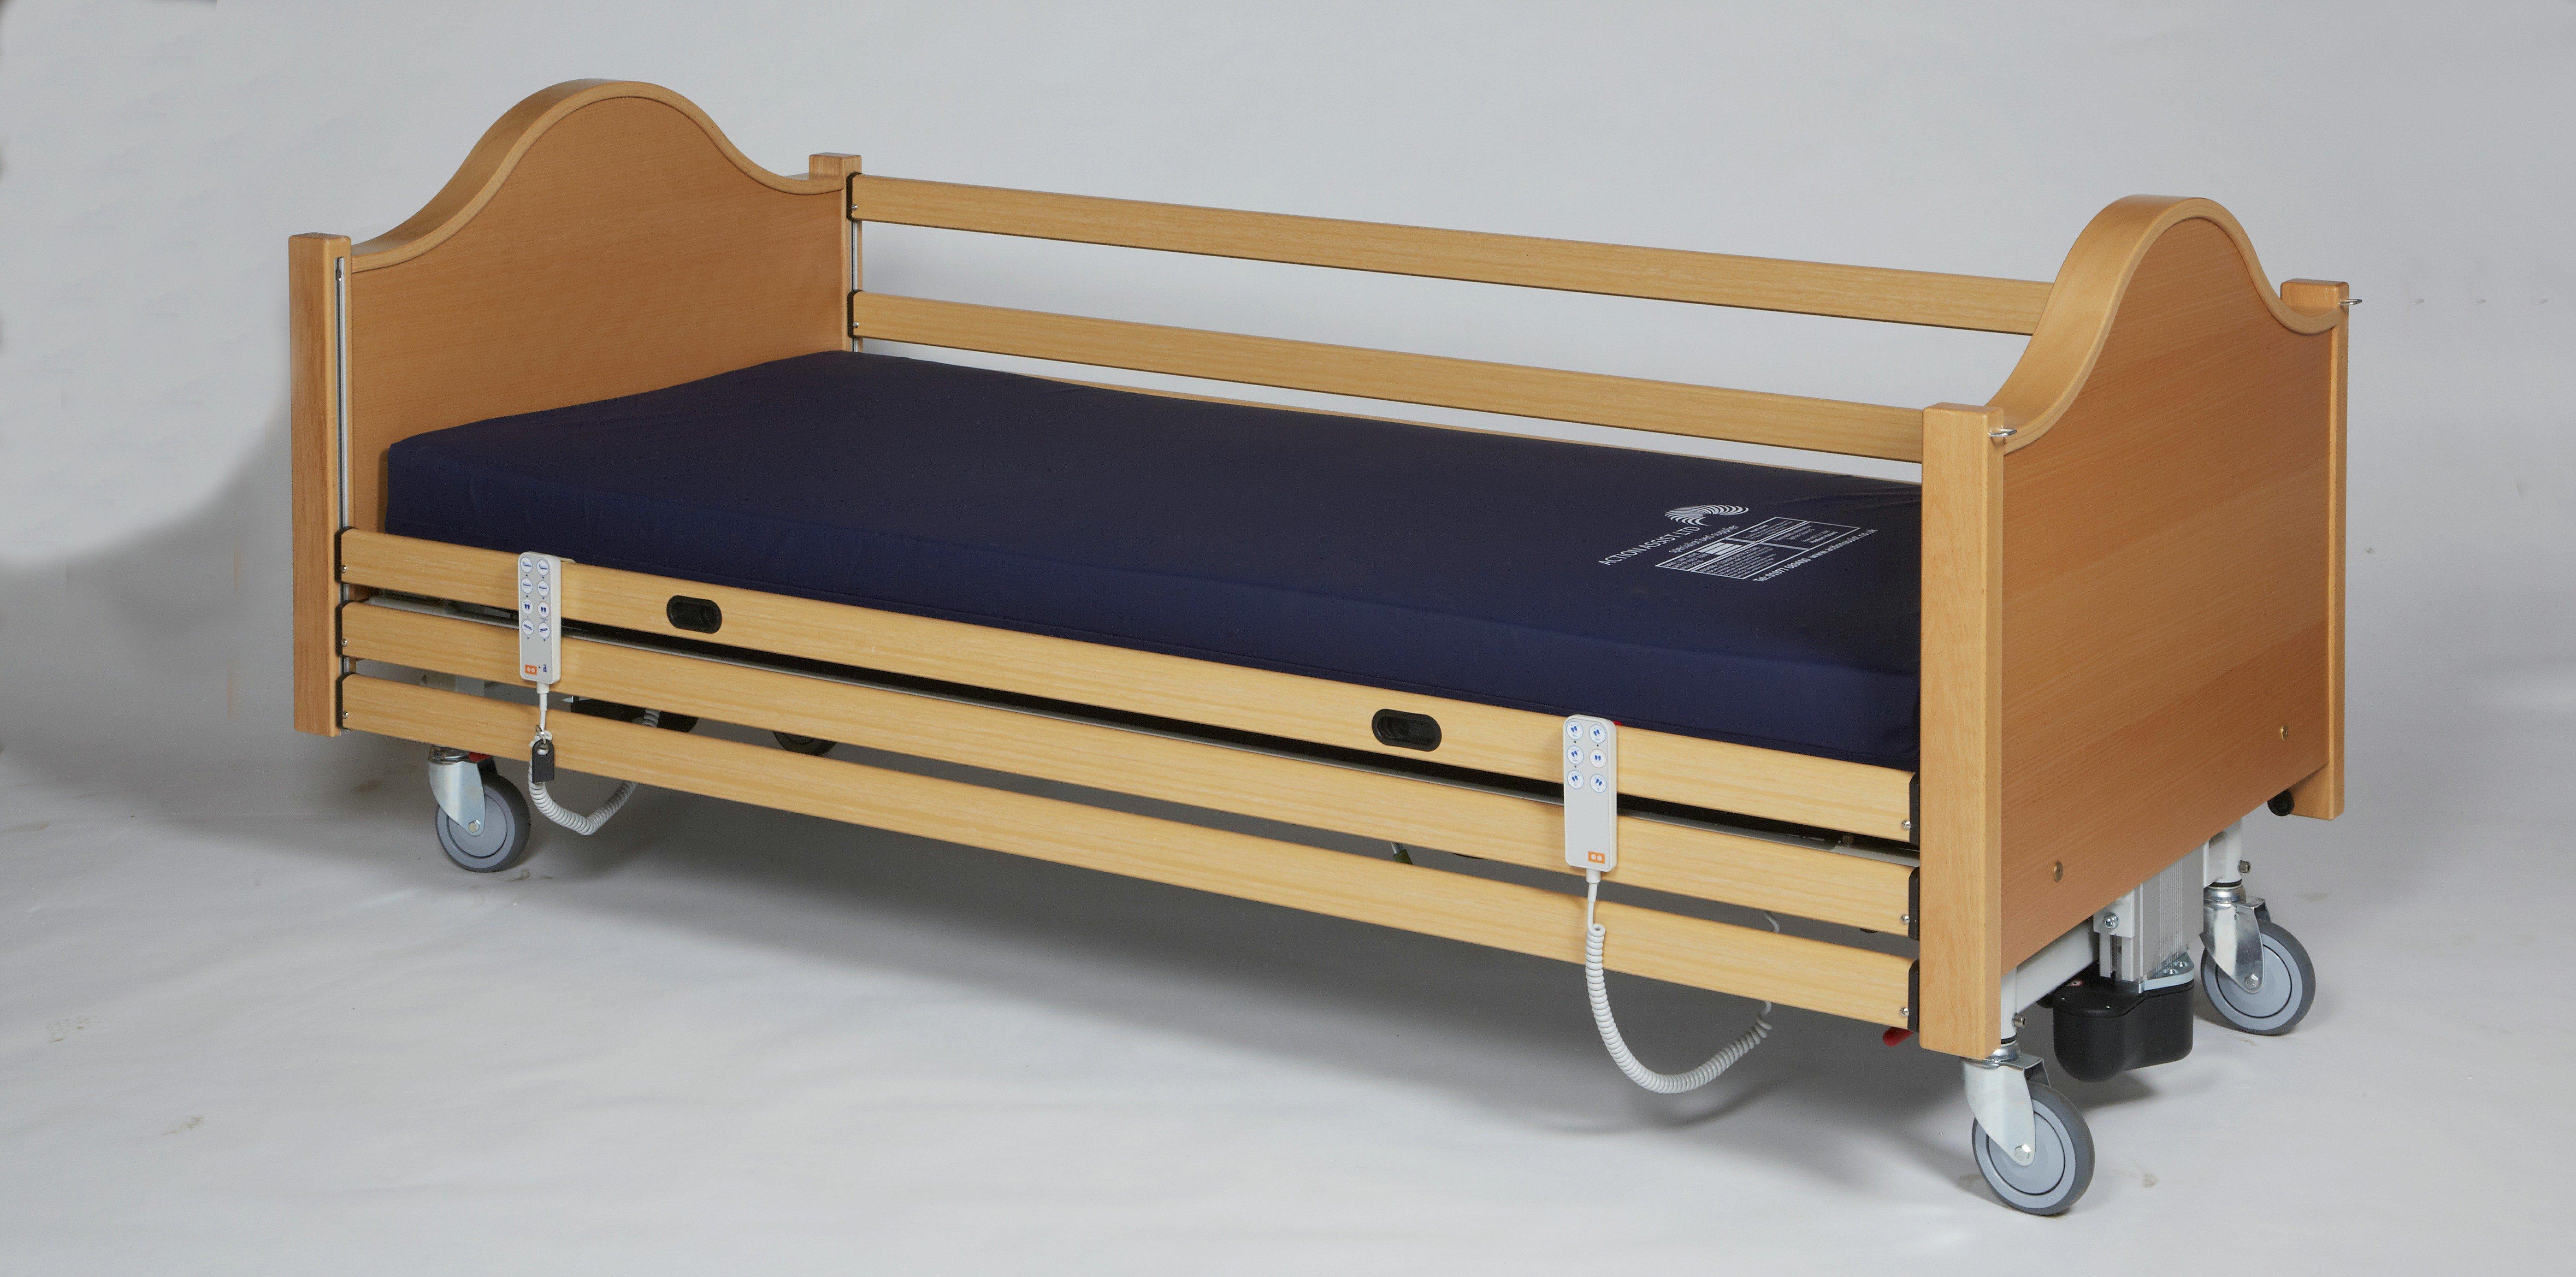 Princess 5000 lateral tilting bed.